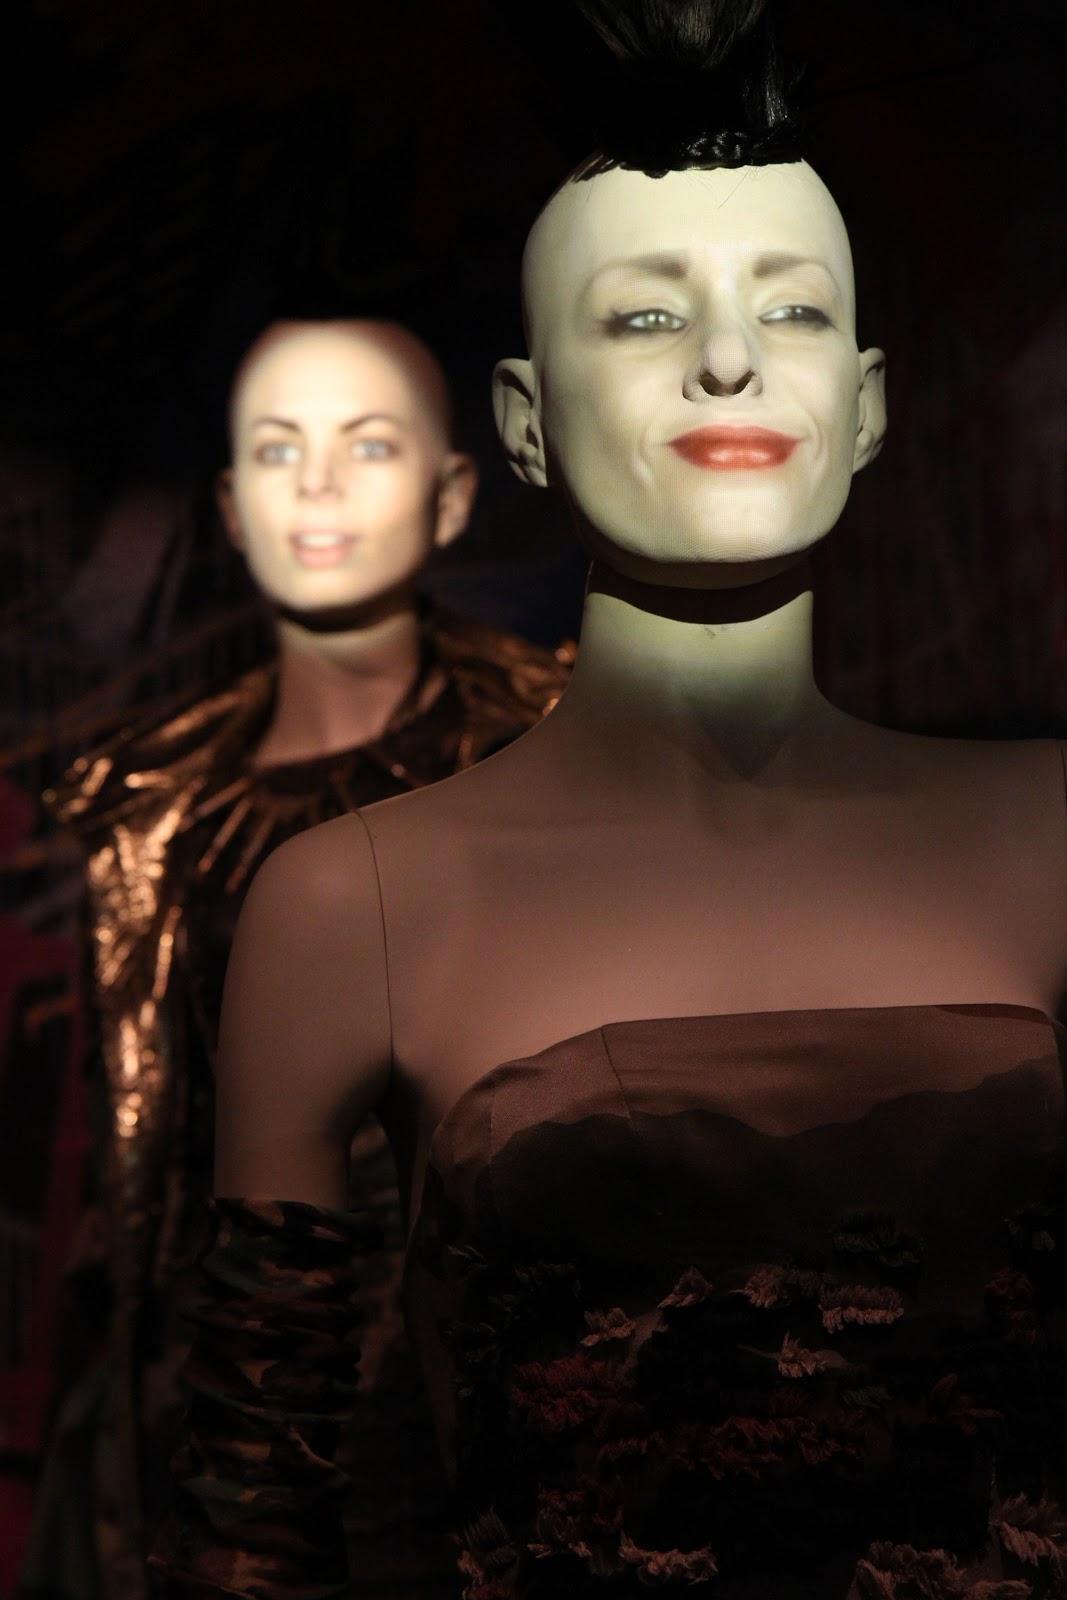 http://1.bp.blogspot.com/-8LdkYQbDUv8/UMYhzbPCvsI/AAAAAAAAAGs/CT8p08Z_3dE/s1600/marta_moslw-my_own_strange_little_world-fashion_blog-moda-andy_elle-andy_leitch-photography-jean_paul_gaultier-exposicion-madrid-05b.jpg